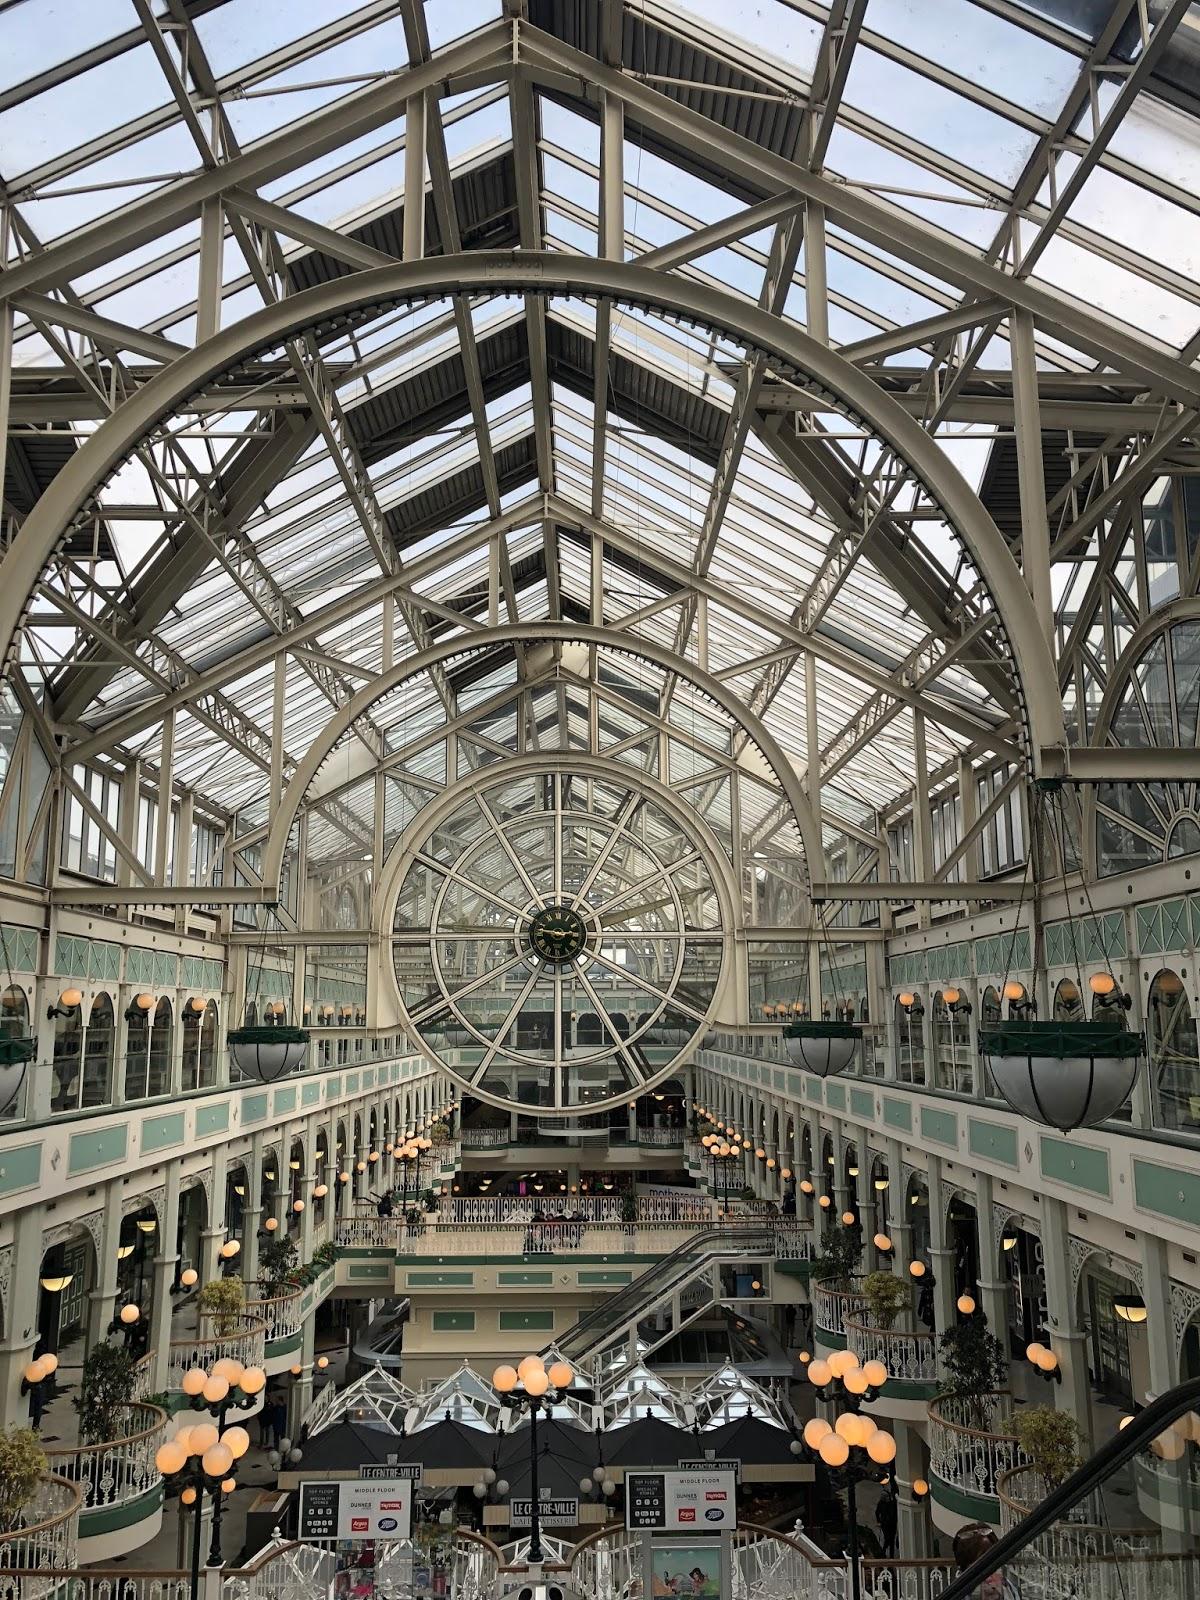 Where to shop in dublin, shopping dublin, mall in dublin